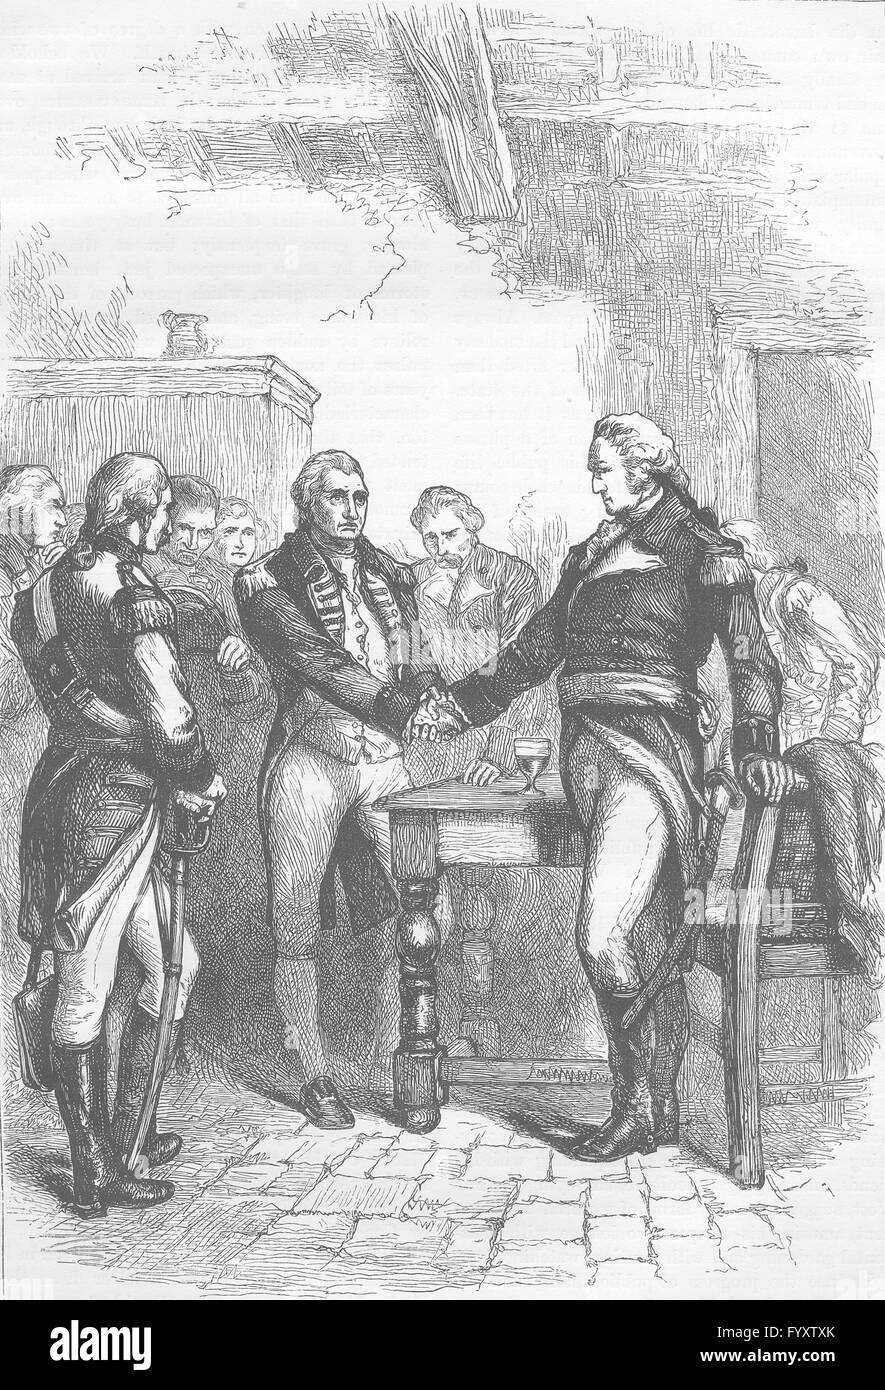 USA: Washington à prendre congé de ses camarades, antique print c1880 Photo Stock